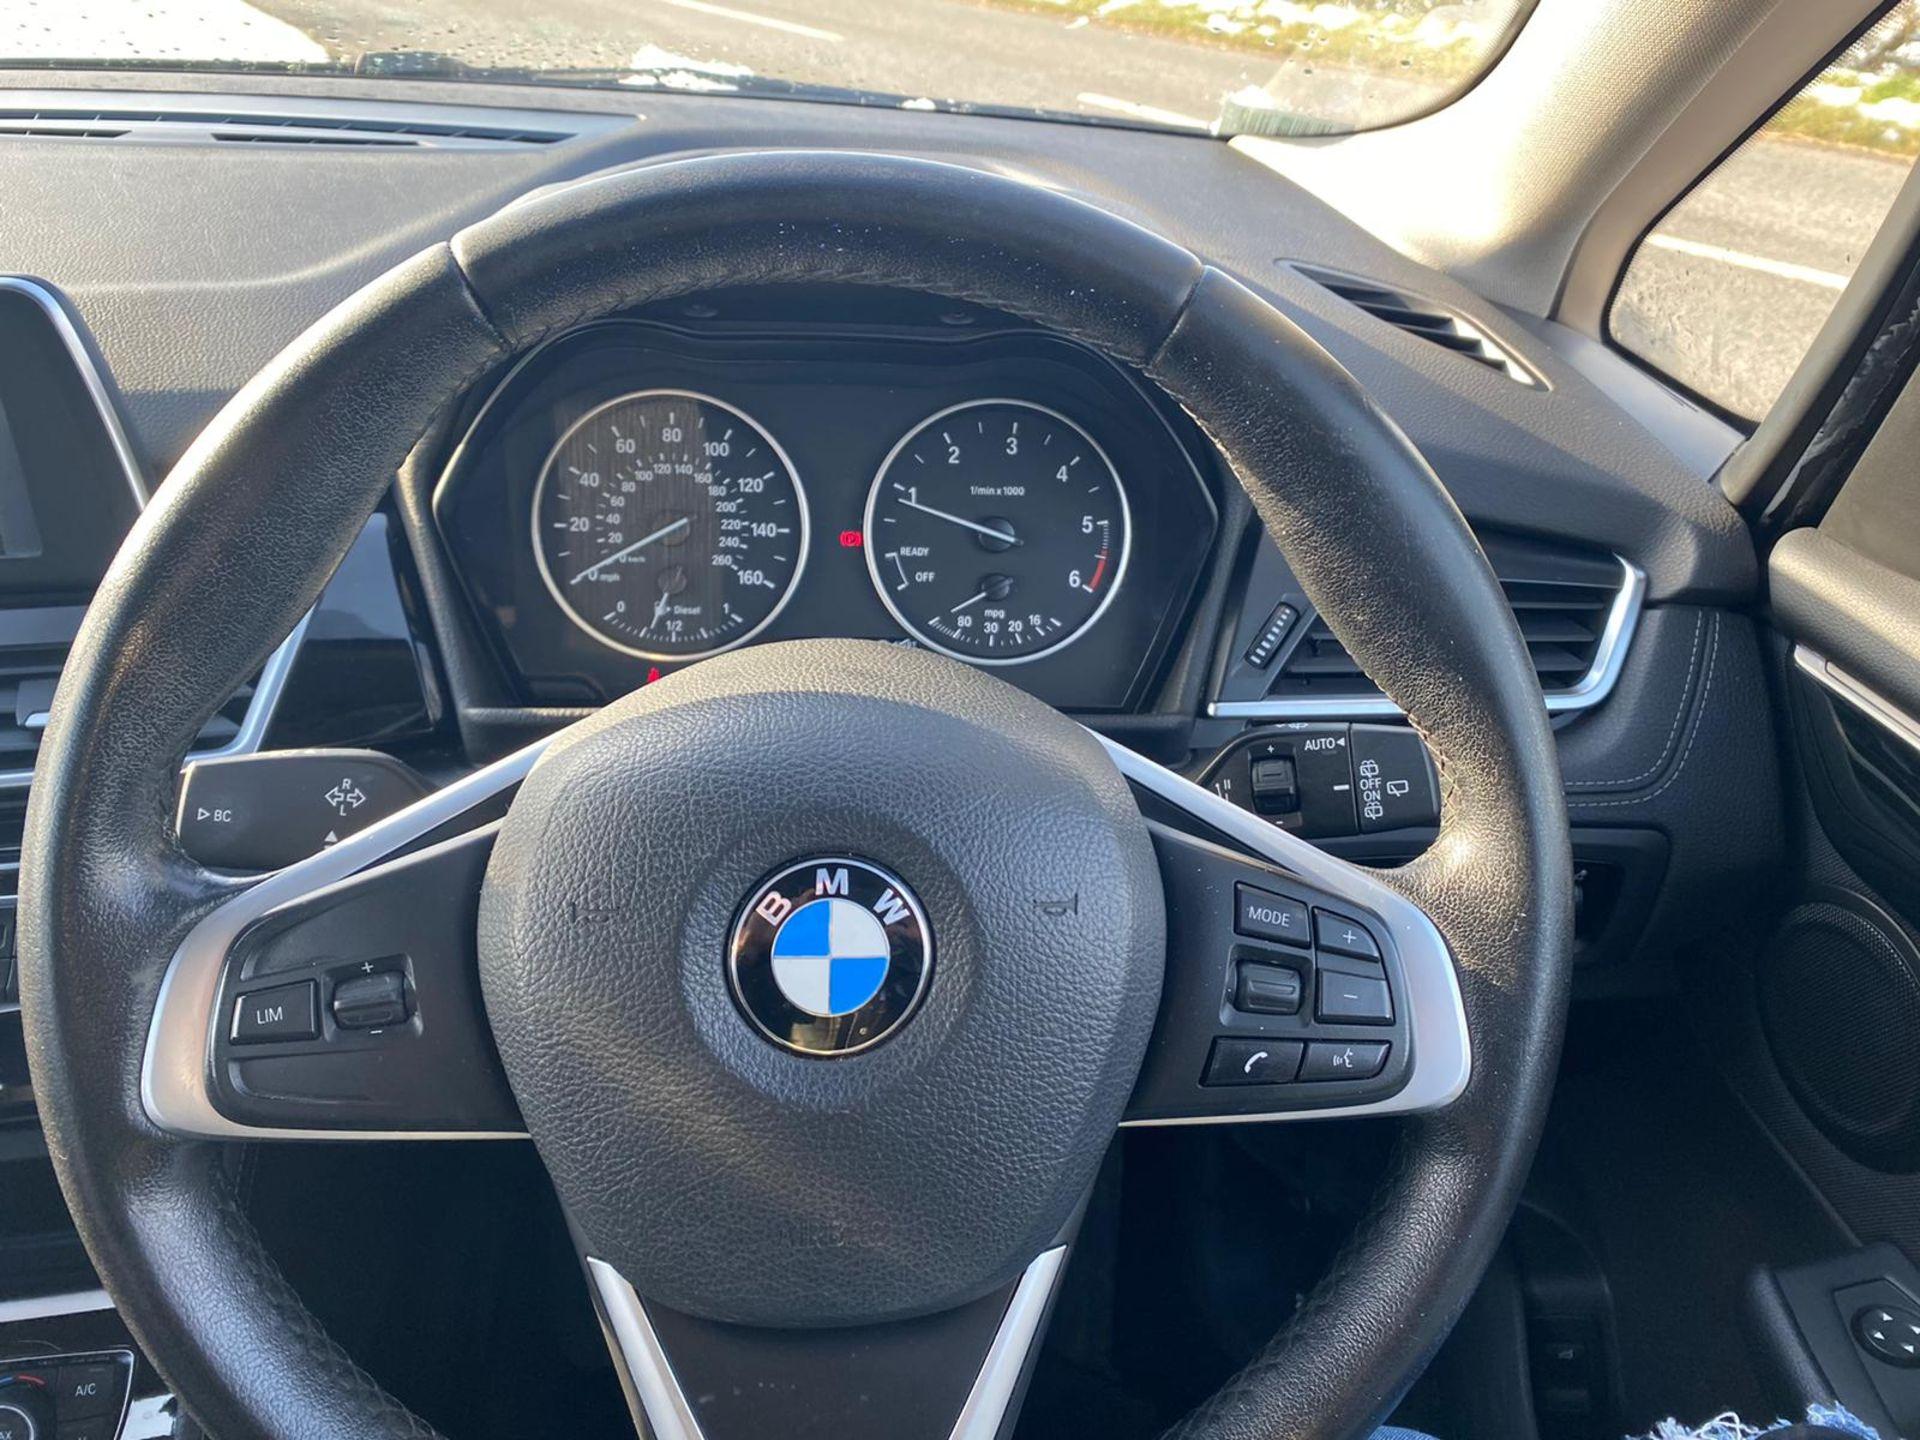 "ON SALE BMW 218d ""SPORT"" MPV 2.0 DIESEL ""EURO 6"" (2016 REG) - 1 OWNER - GREAT SPEC - BLACK - LOOK!! - Image 14 of 16"